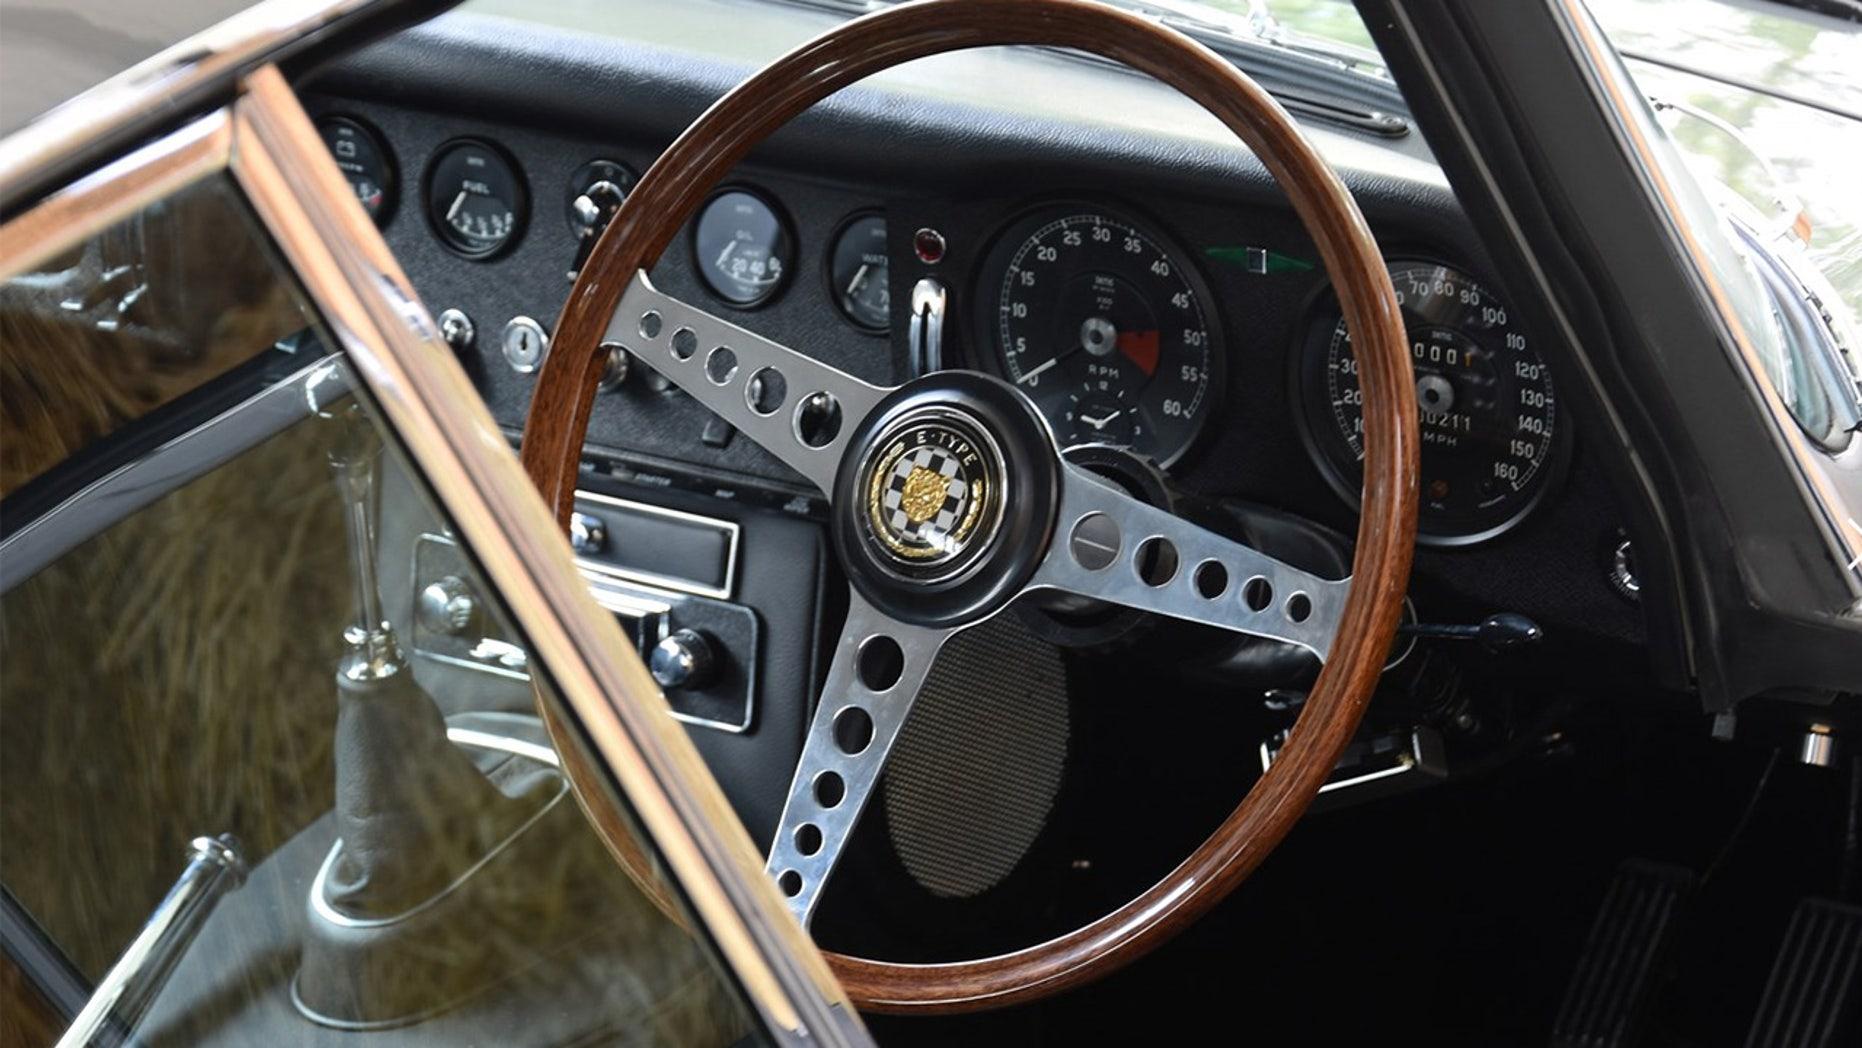 1964 Jaguar E-Type interior